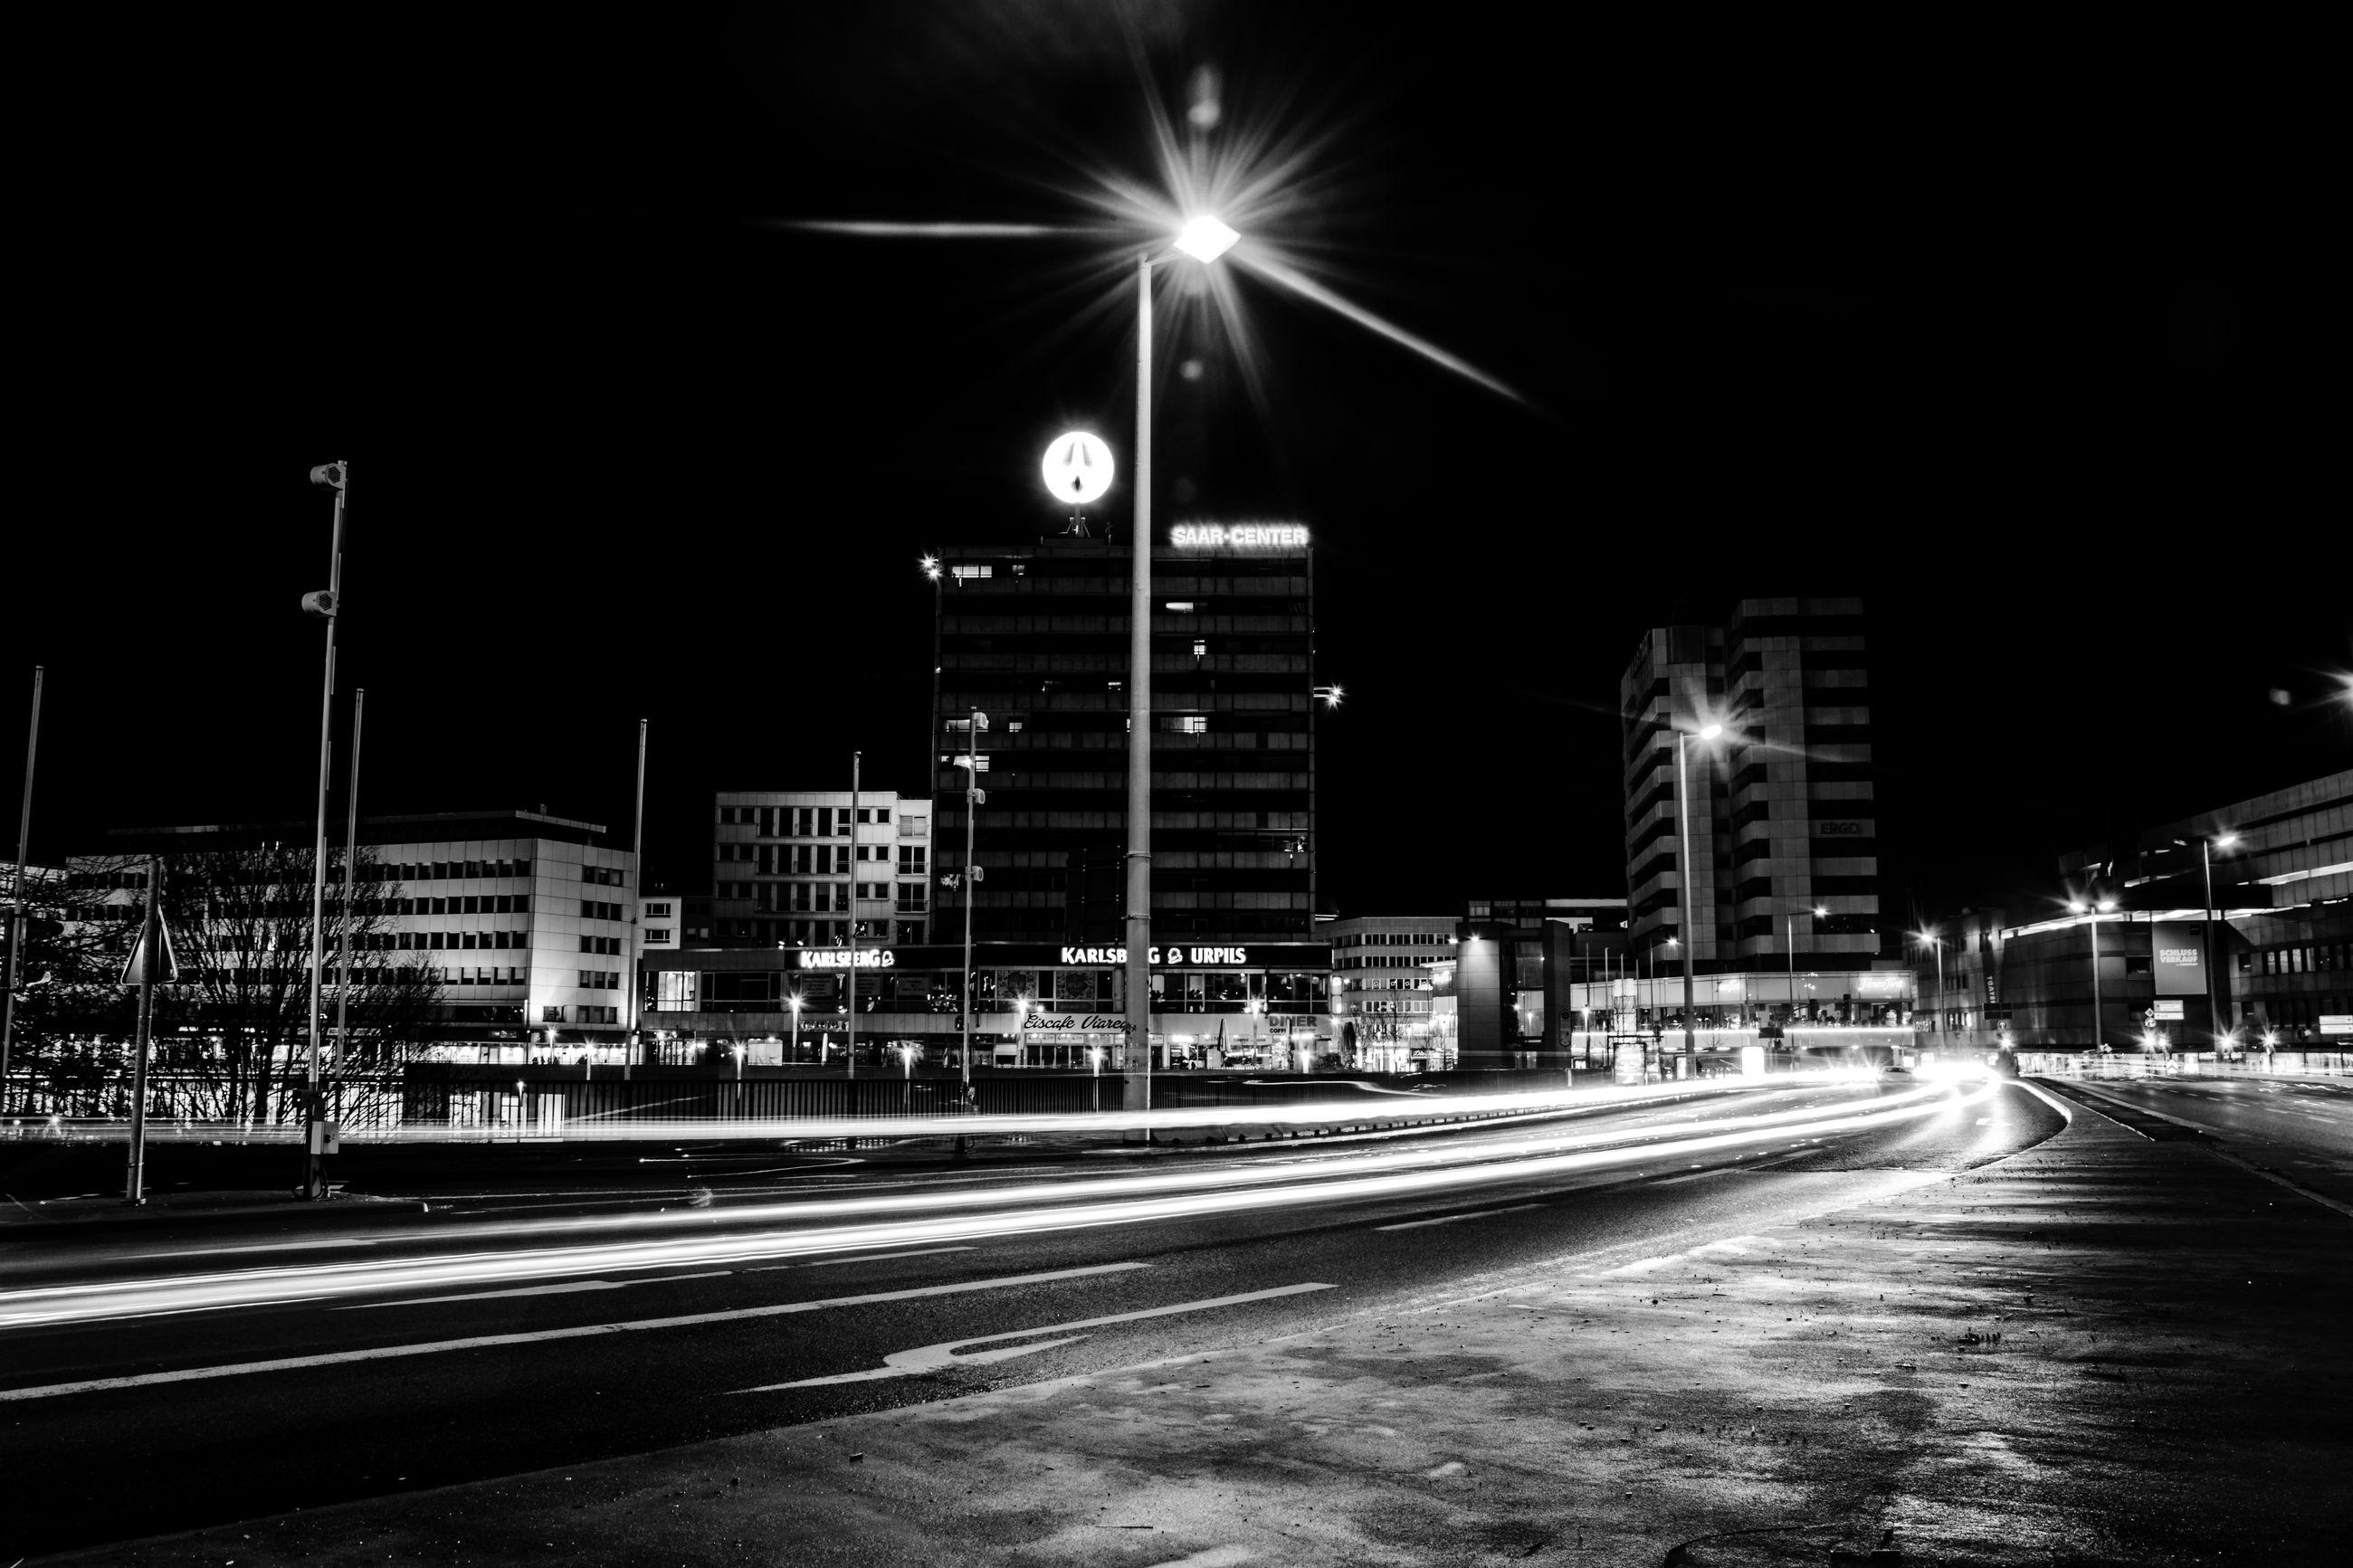 LIGHT TRAILS ON CITY STREET